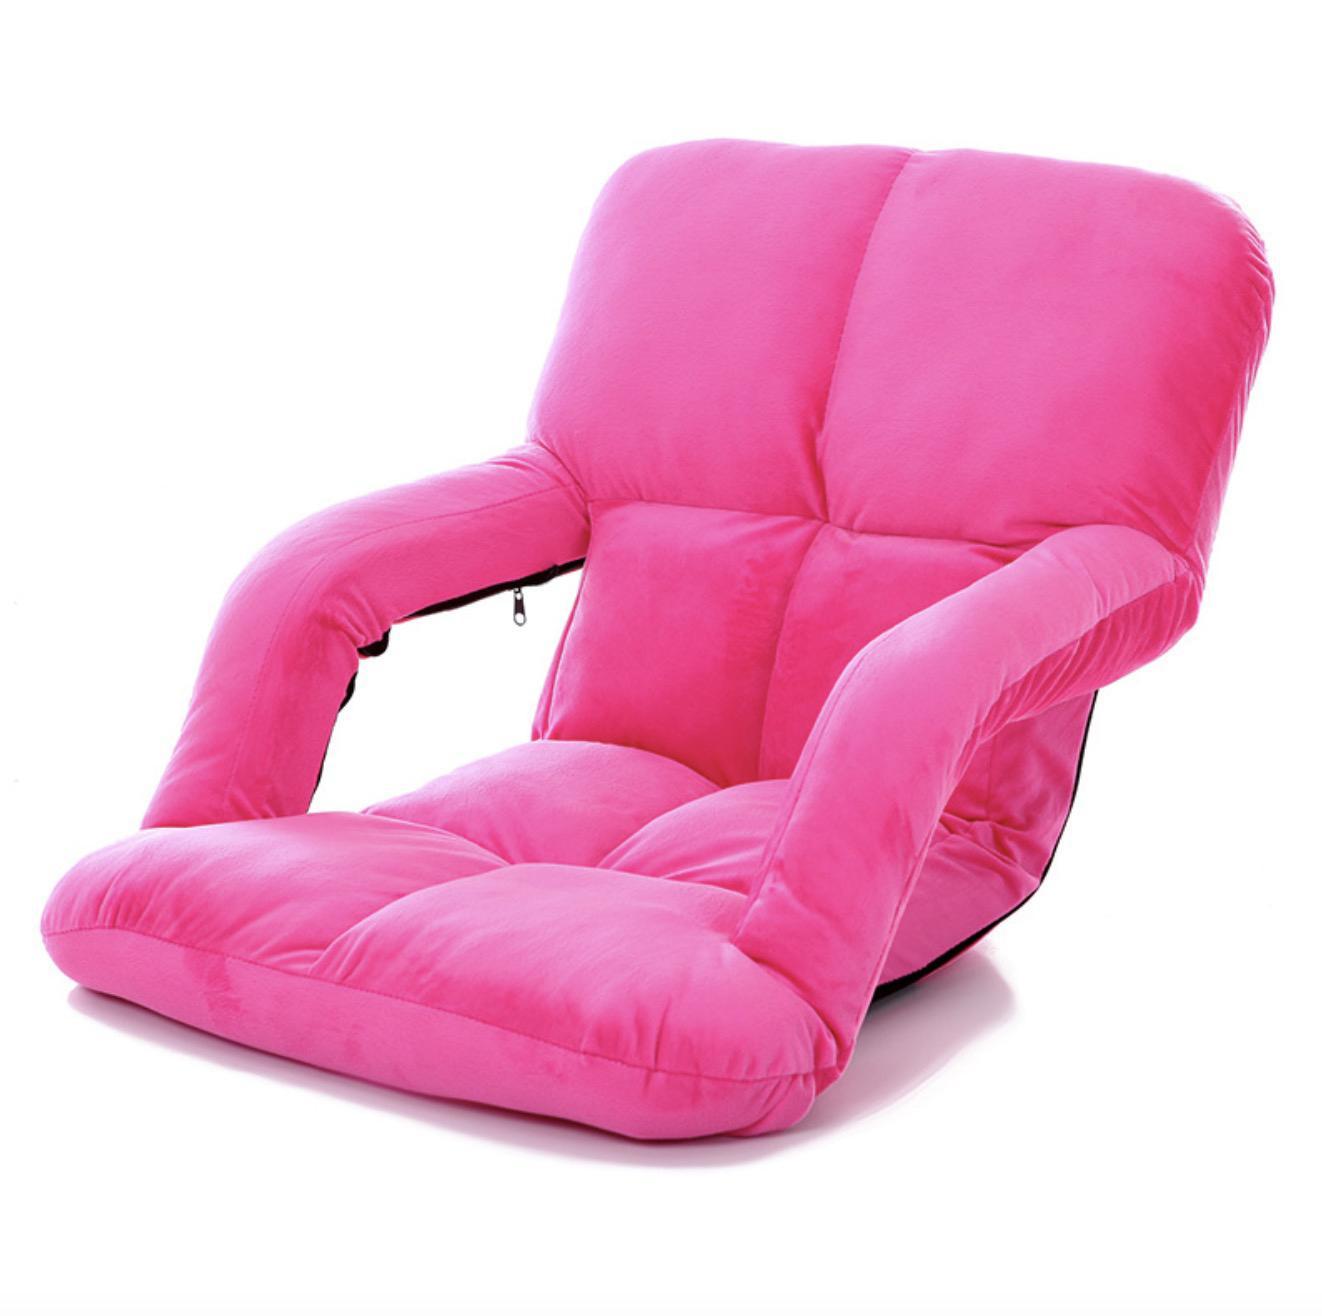 JIJI (Cotton Suede) 18 Cubes Washable 3-Fold Floor Chair Sofa with Armrest (95x58x13cm) (Floor Chair) - (Floor Chair) Recliner Floor chair/ (SG)